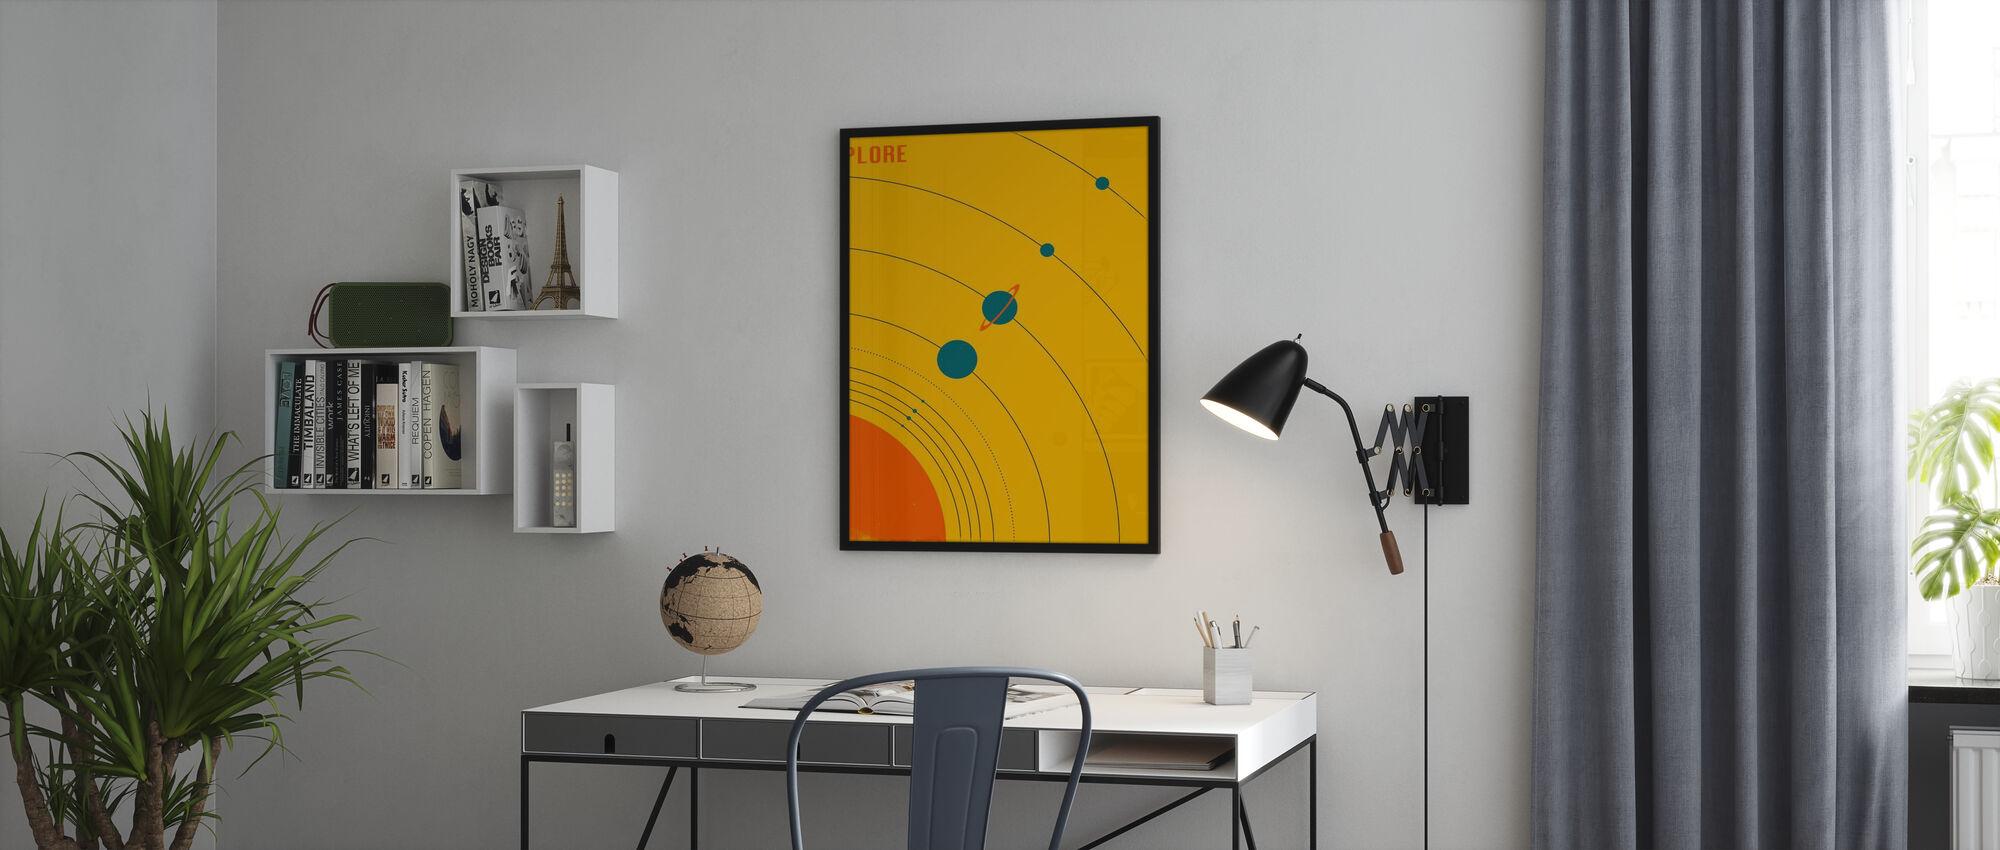 Solsystem - Utforska - Inramad tavla - Kontor